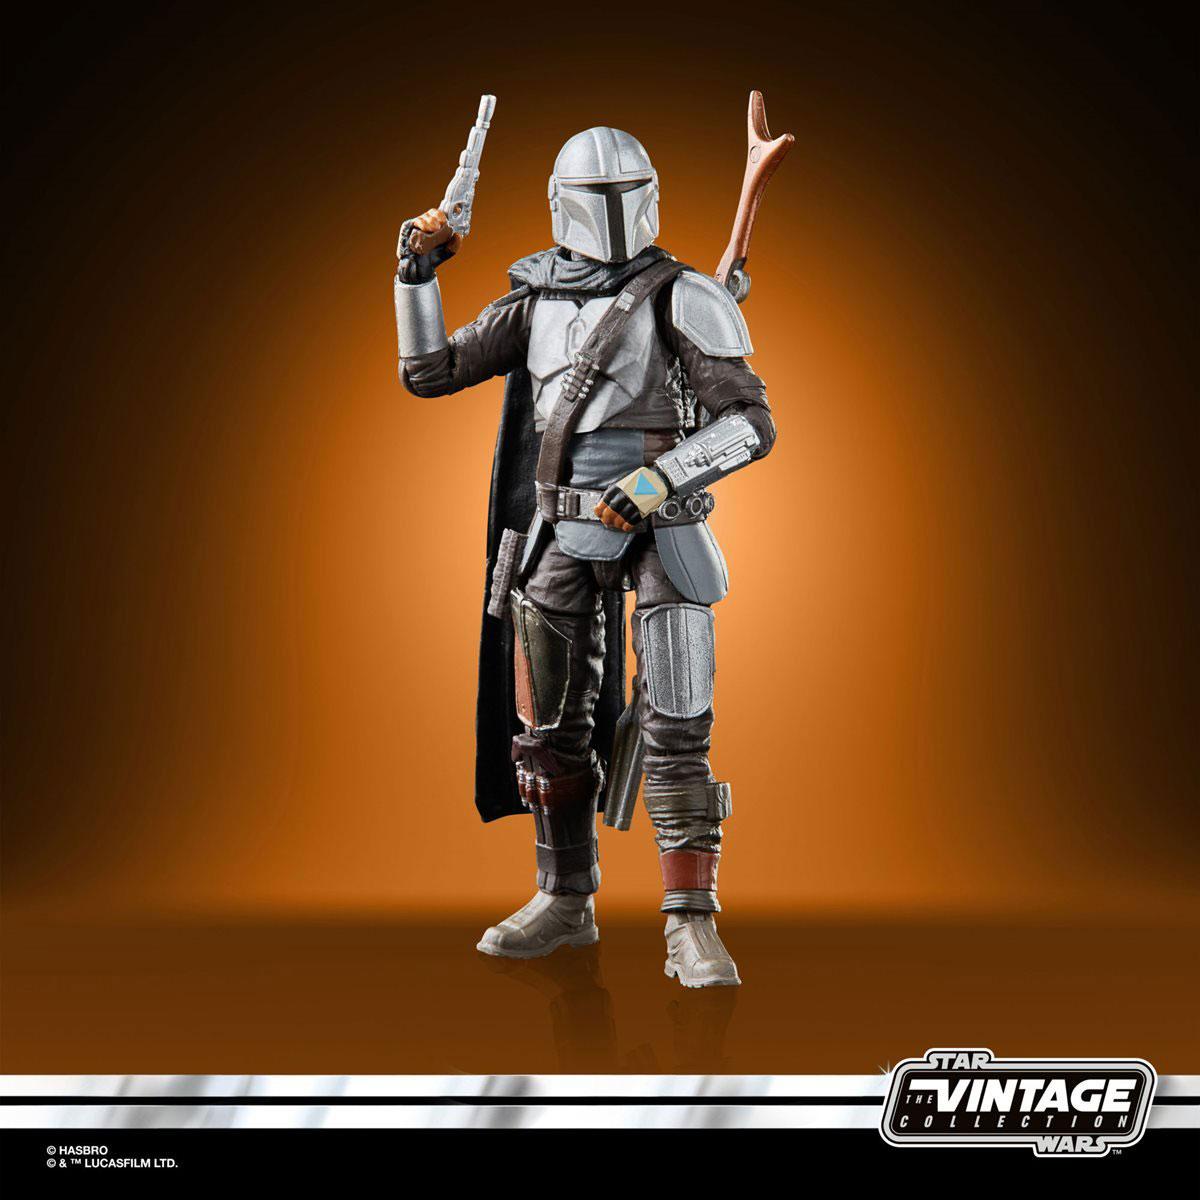 star-wars-vintage-collection-mandalorian-in-beskar-armor-action-figure-6